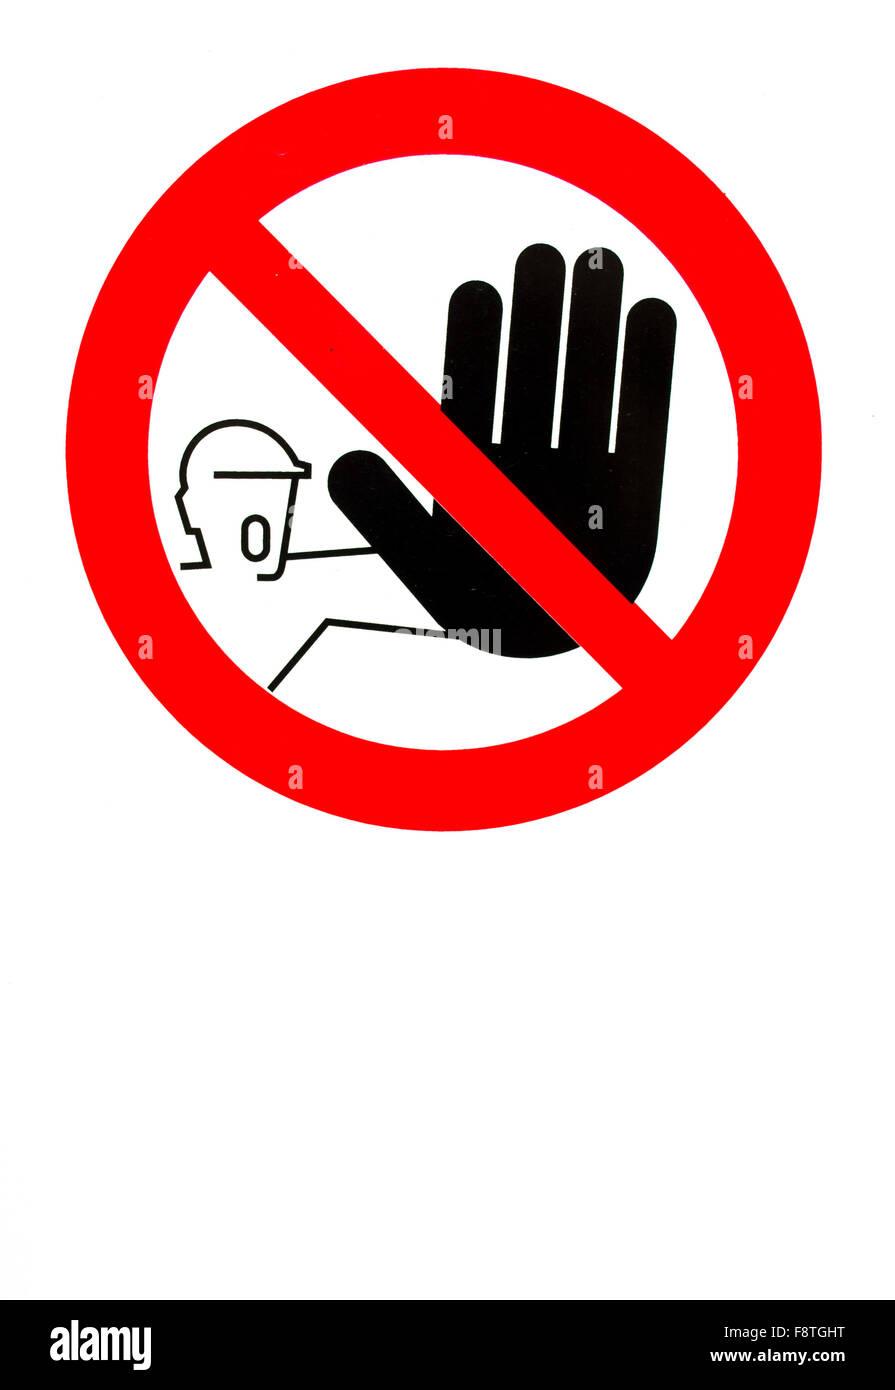 No pass sign - Stock Image